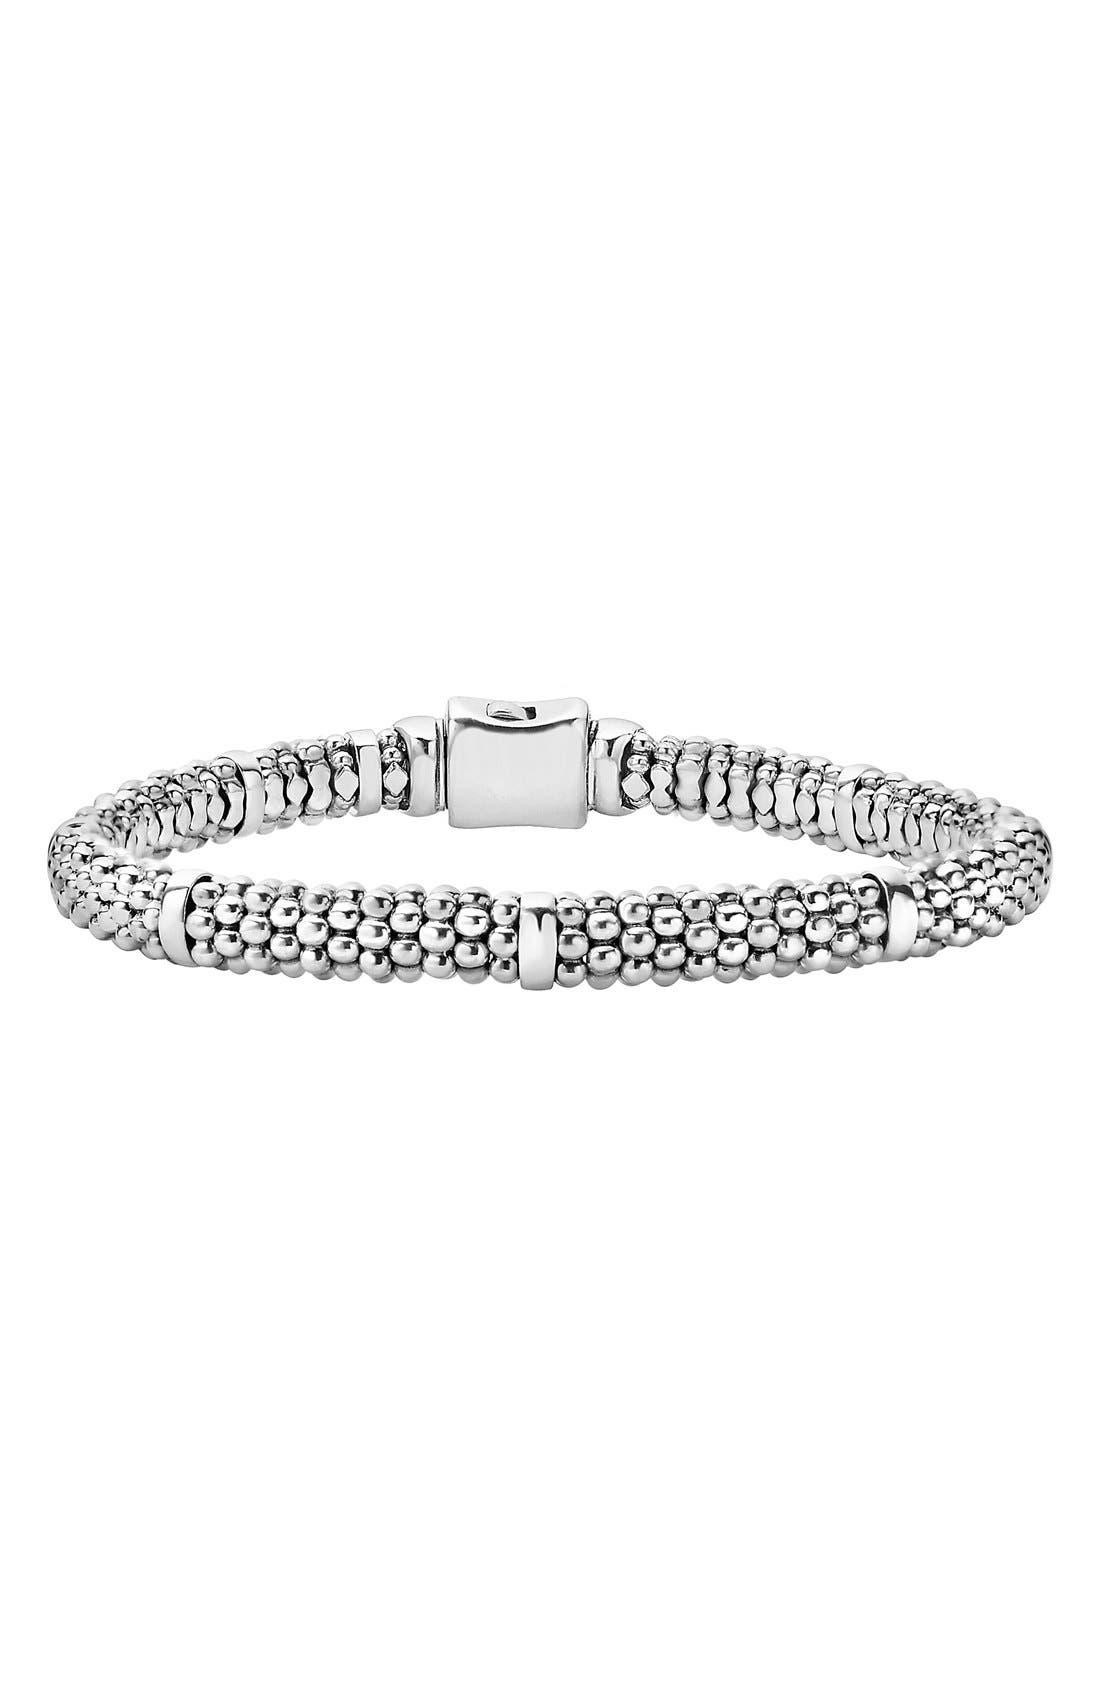 Caviar Rope Station Bracelet,                             Main thumbnail 1, color,                             040